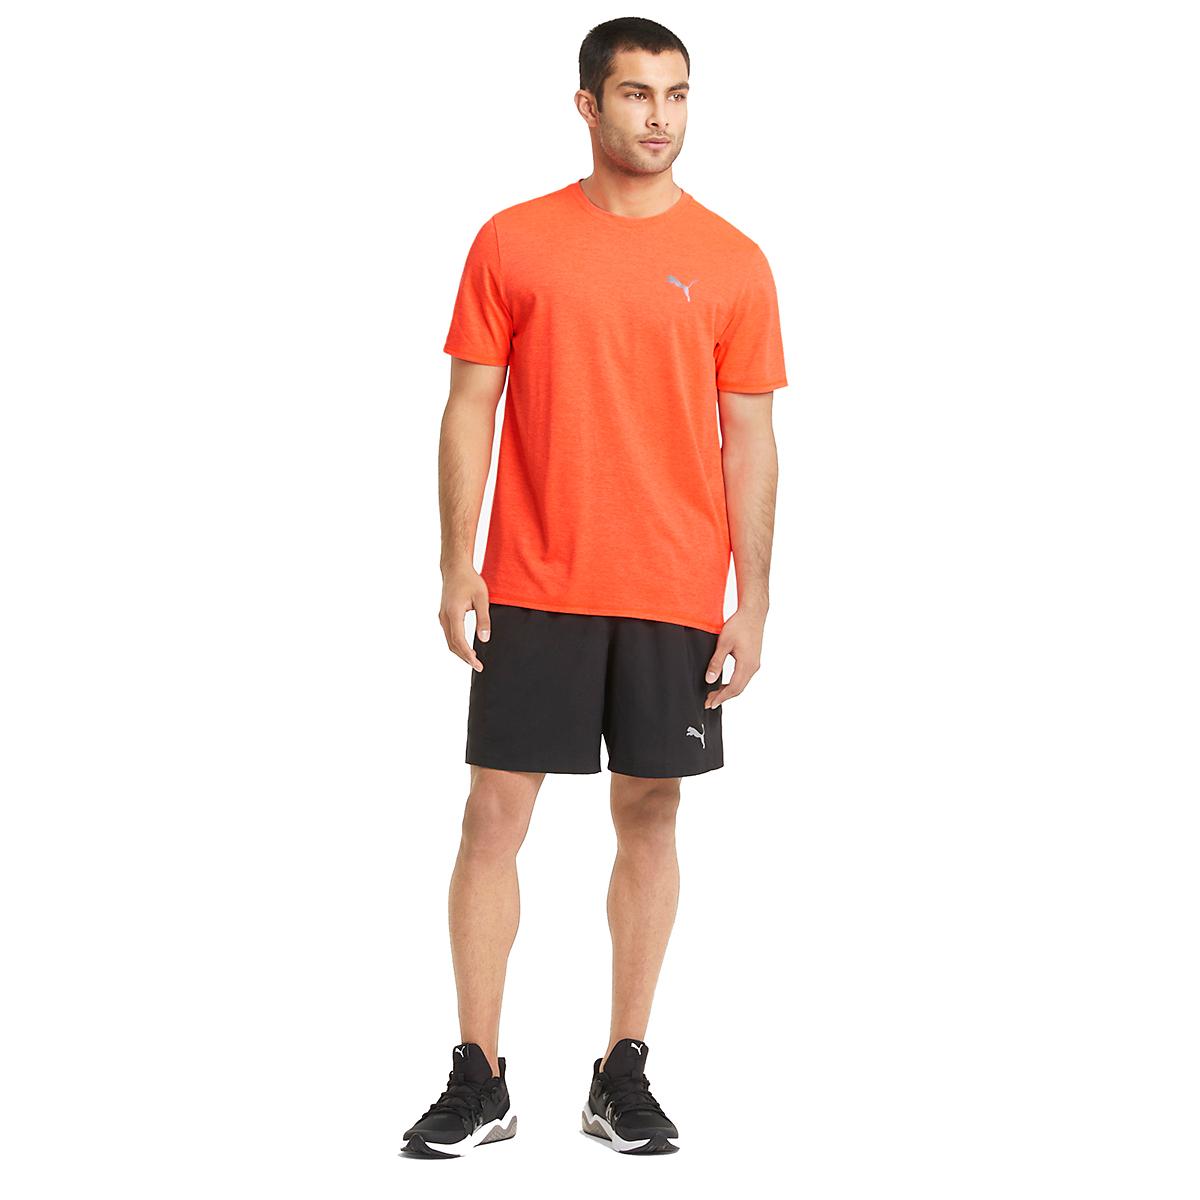 Men's Puma Favorite Heather Short Sleeve Running Tee - Color: Lava Blast - Size: S, Lava Blast, large, image 3